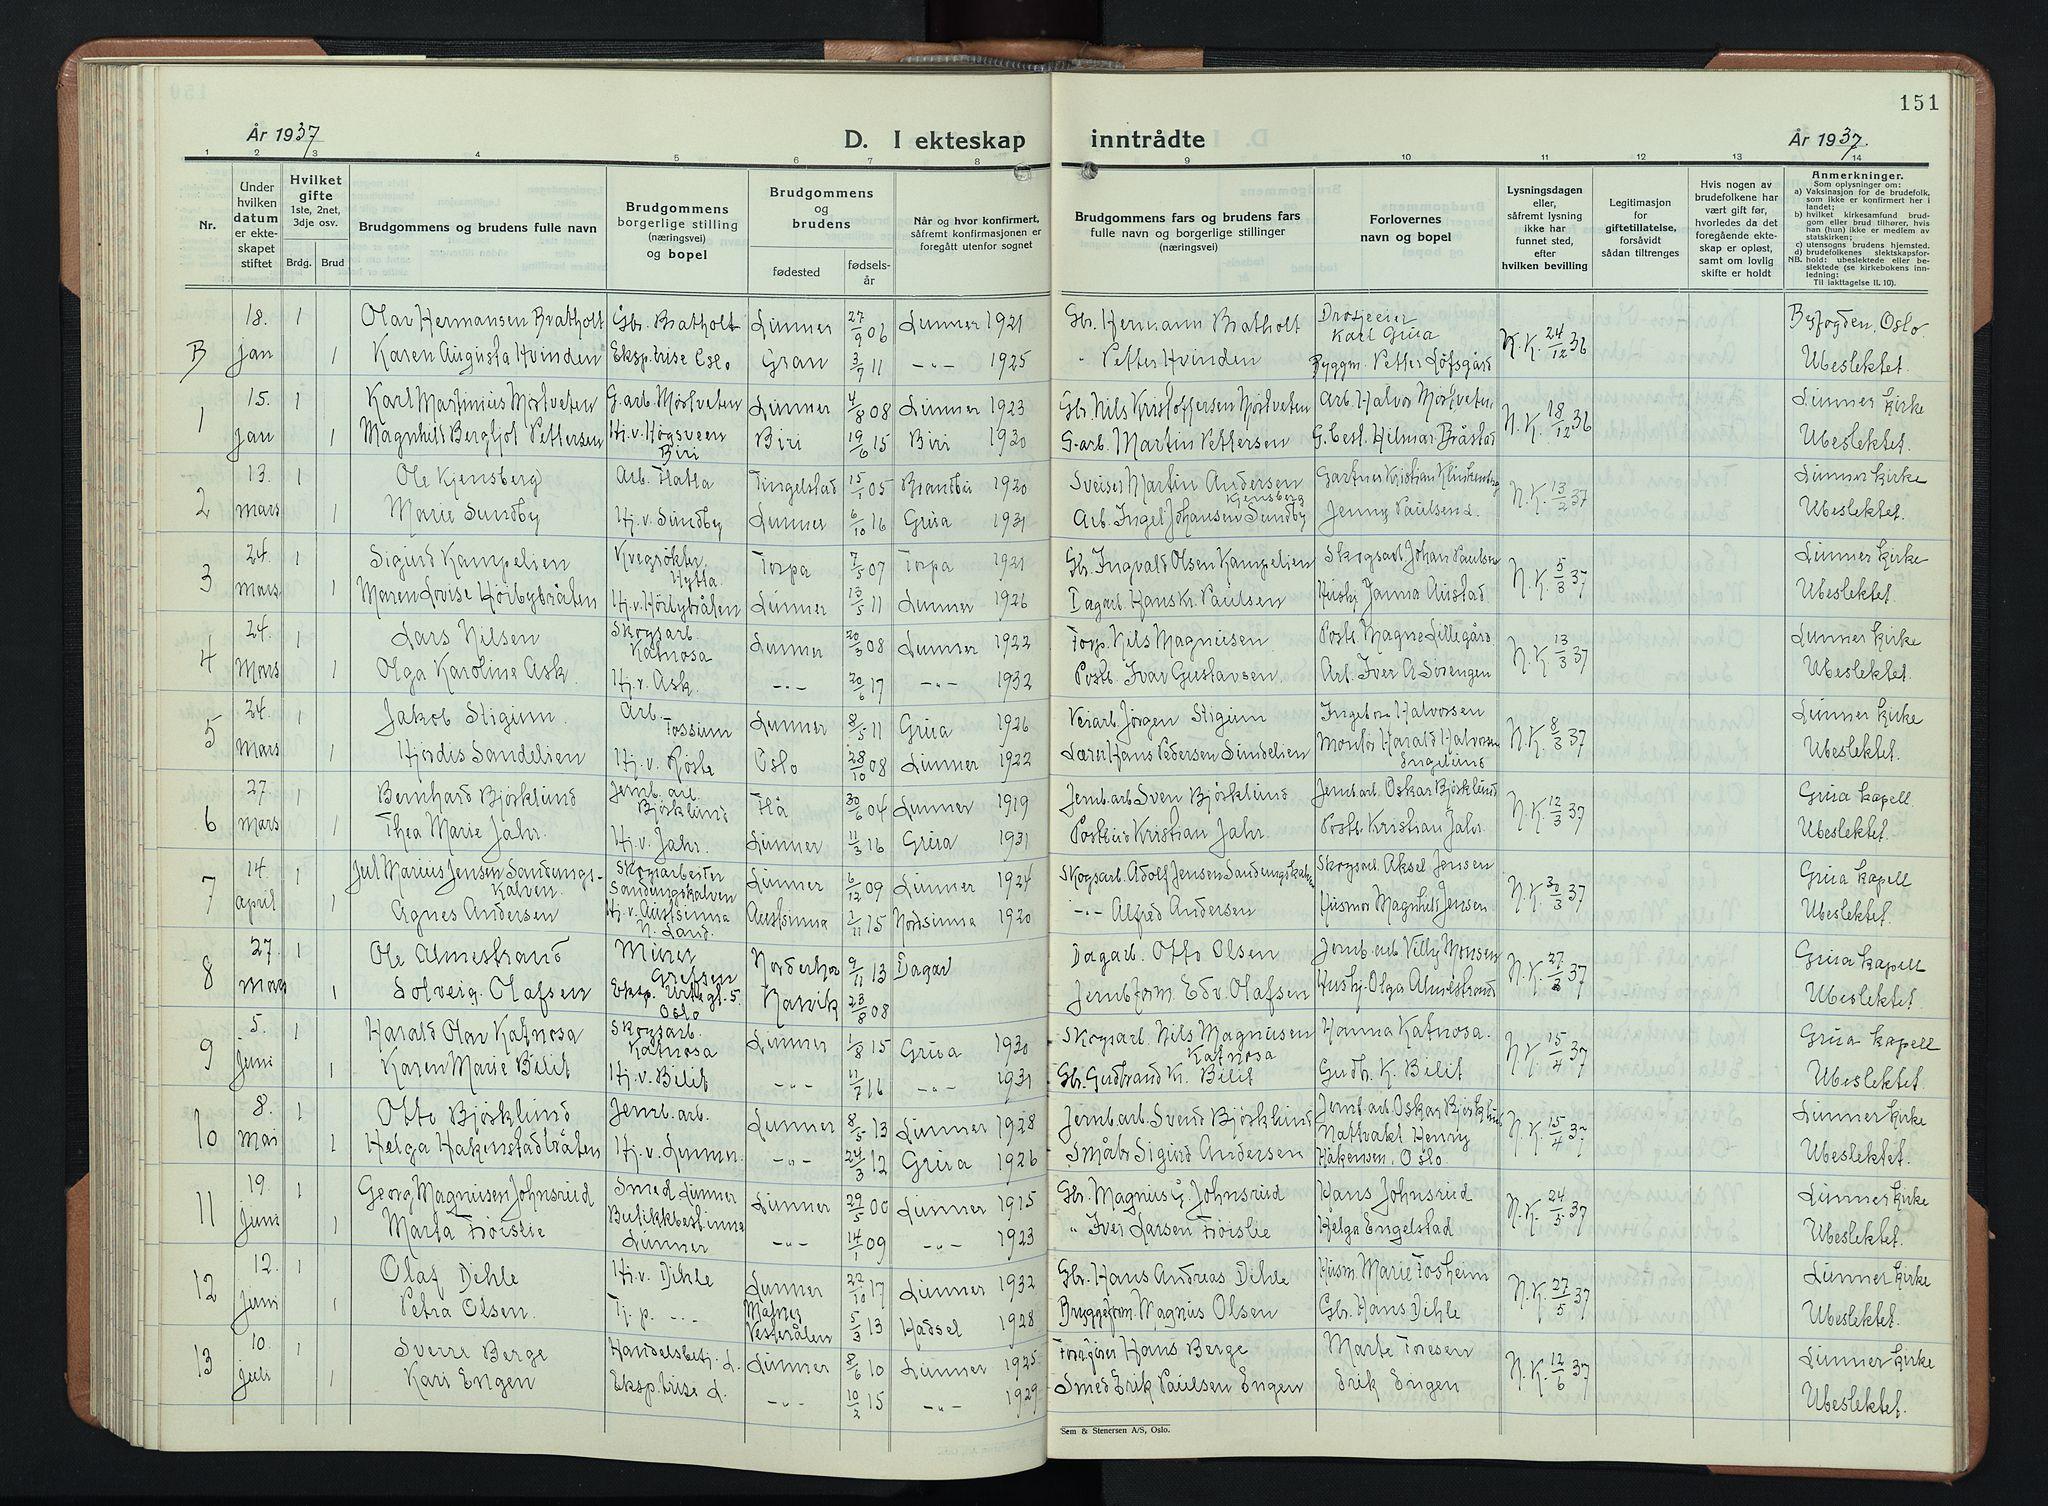 SAH, Lunner prestekontor, H/Ha/Hab/L0003: Klokkerbok nr. 3, 1933-1945, s. 151